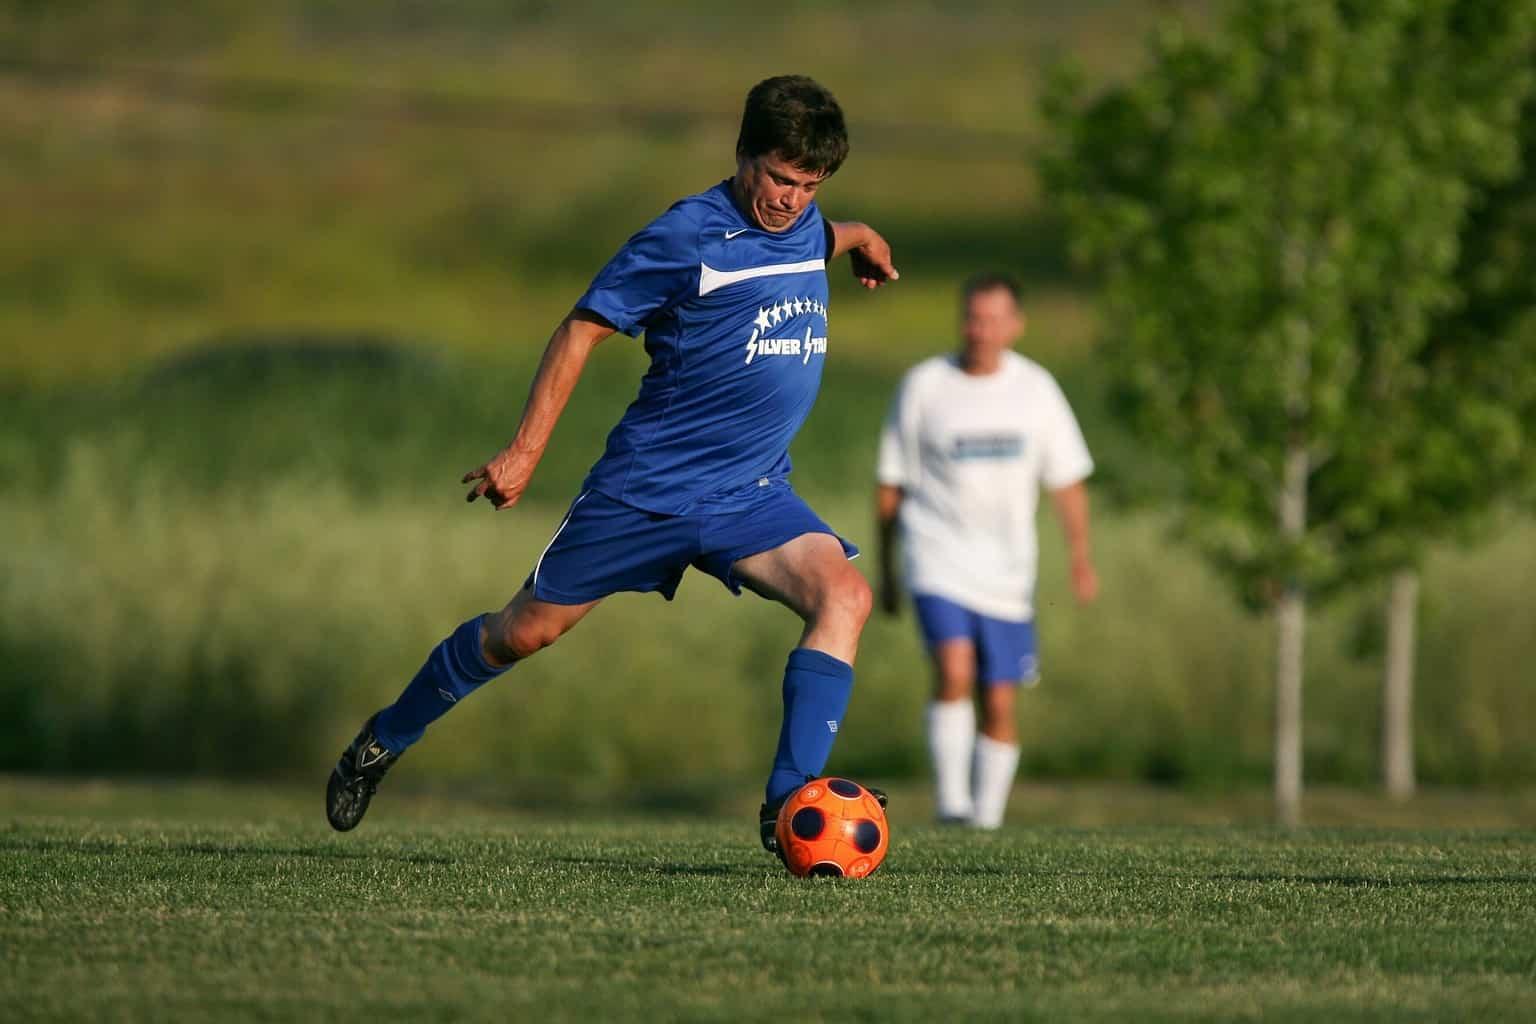 Man in blue kicks the soccer ball